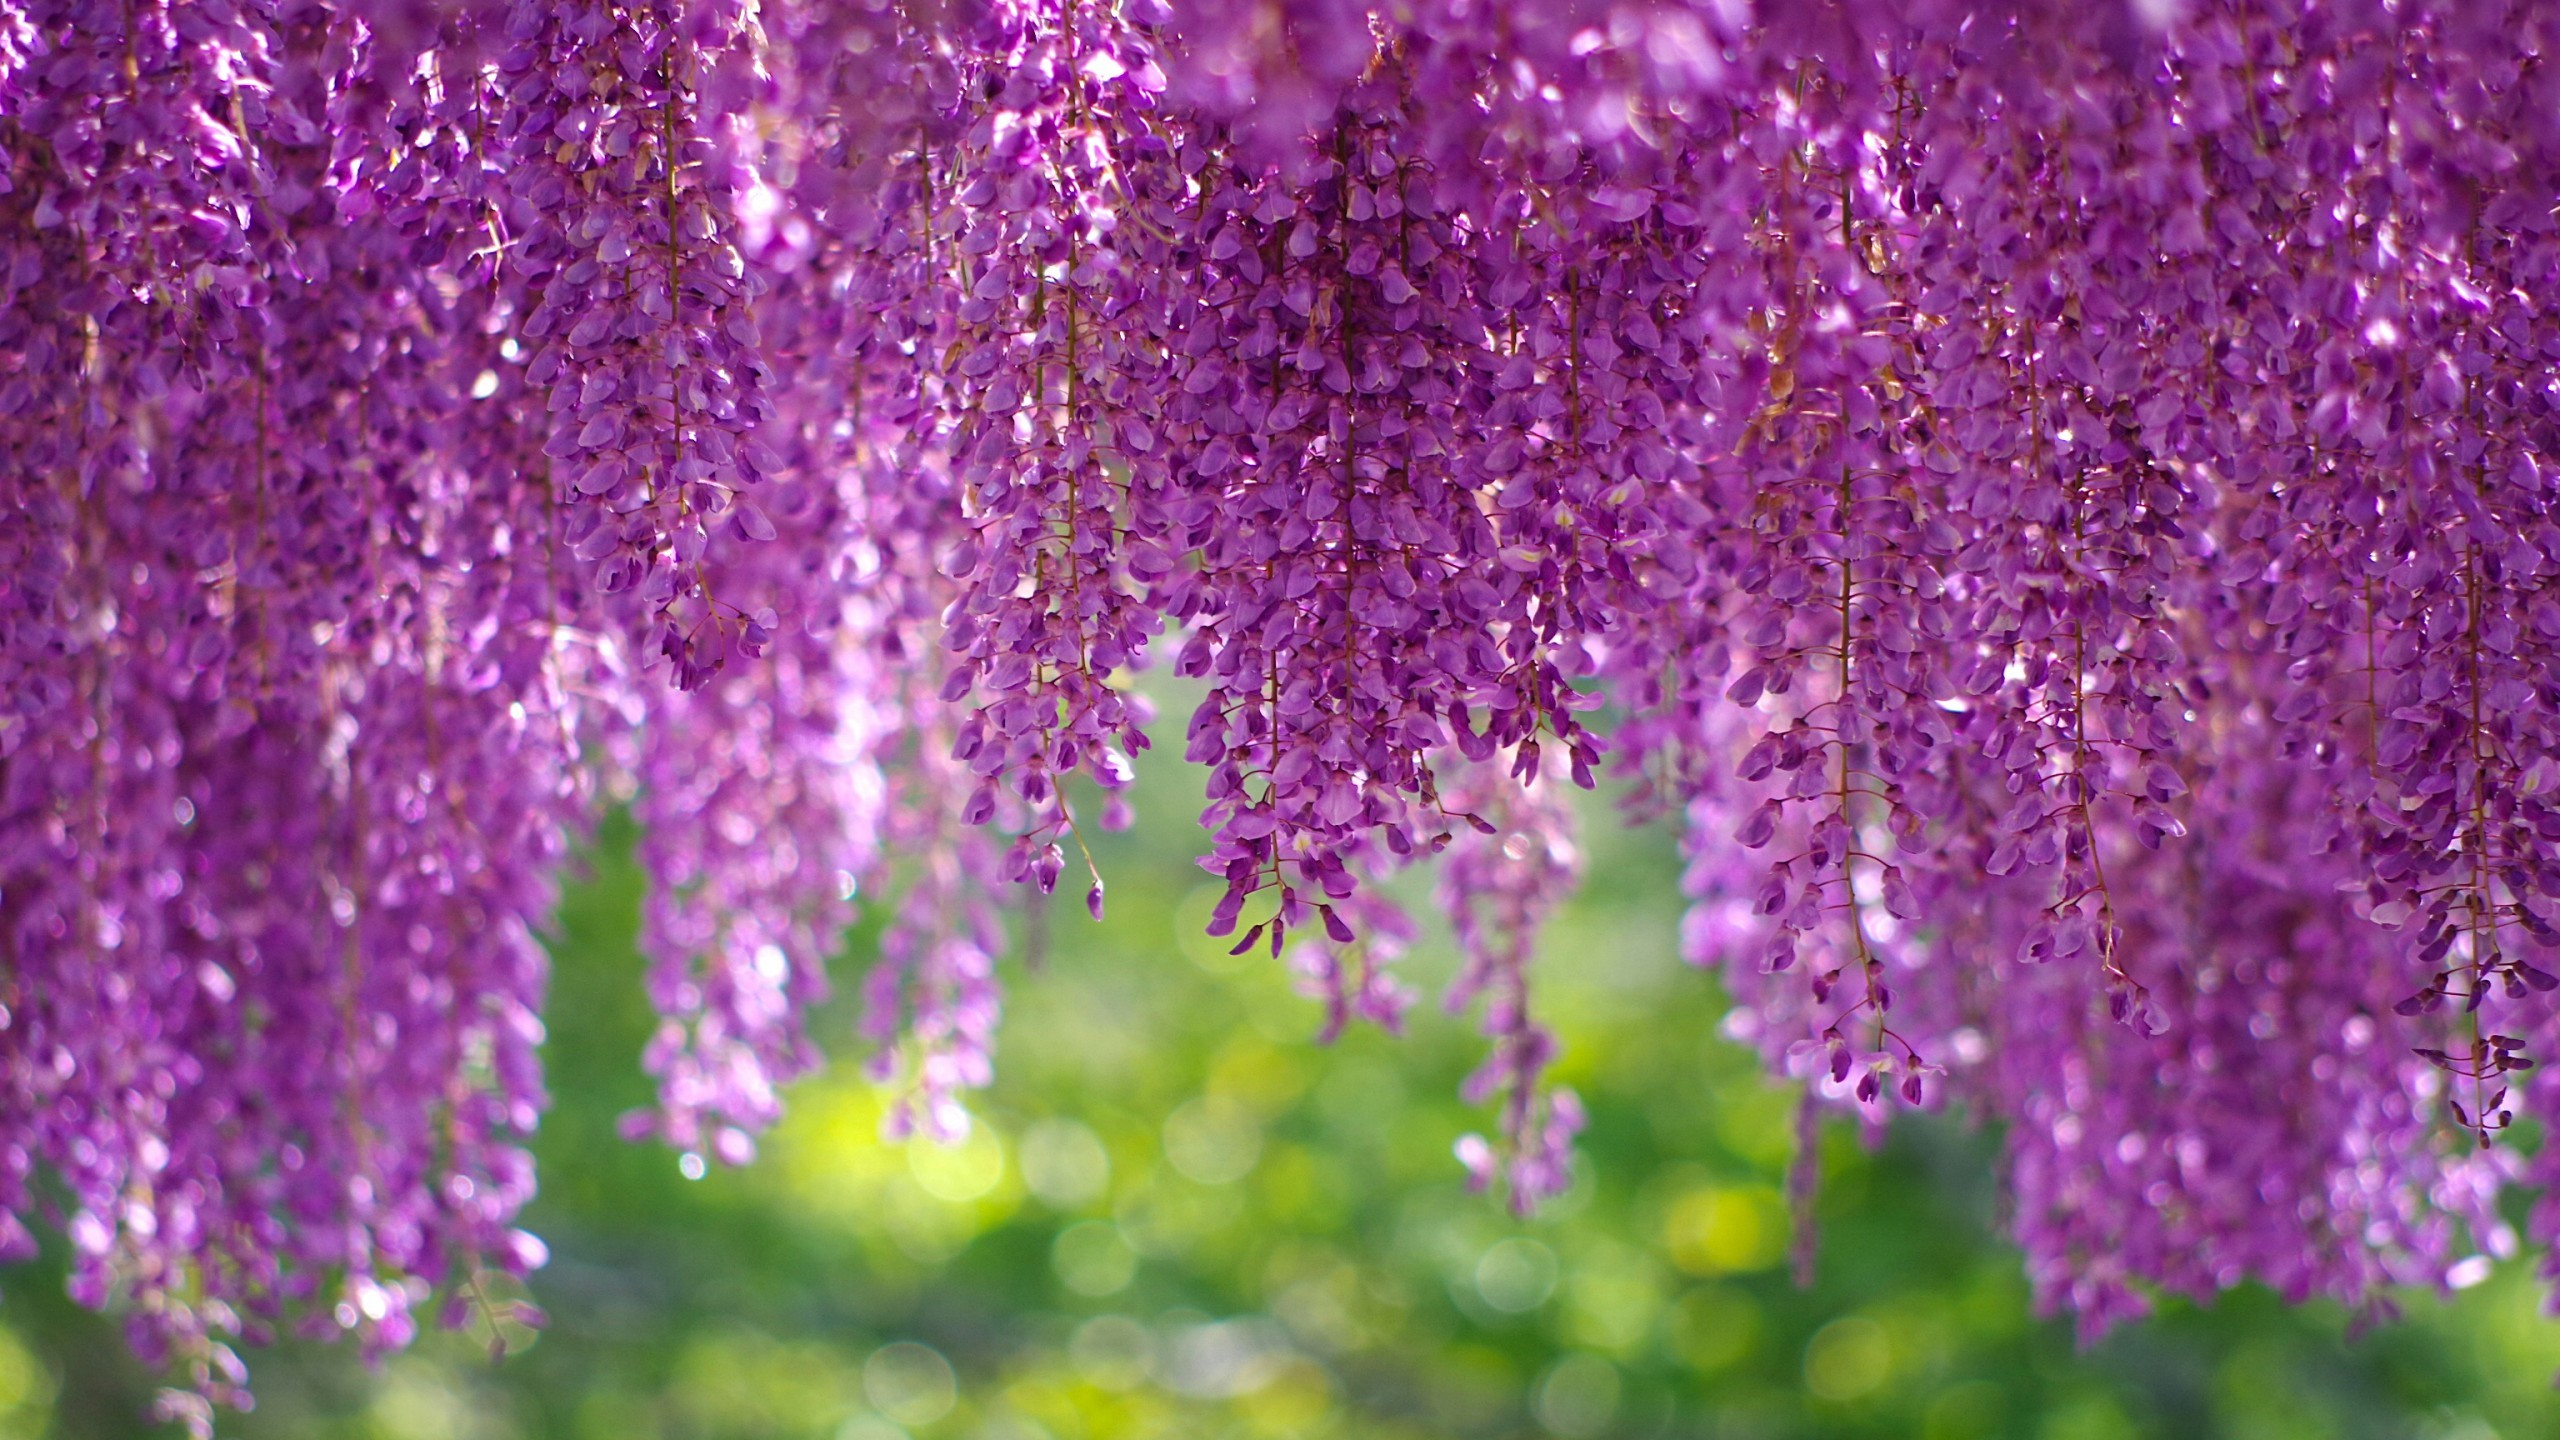 Res: 2560x1440, Nature / Wisteria tree Wallpaper